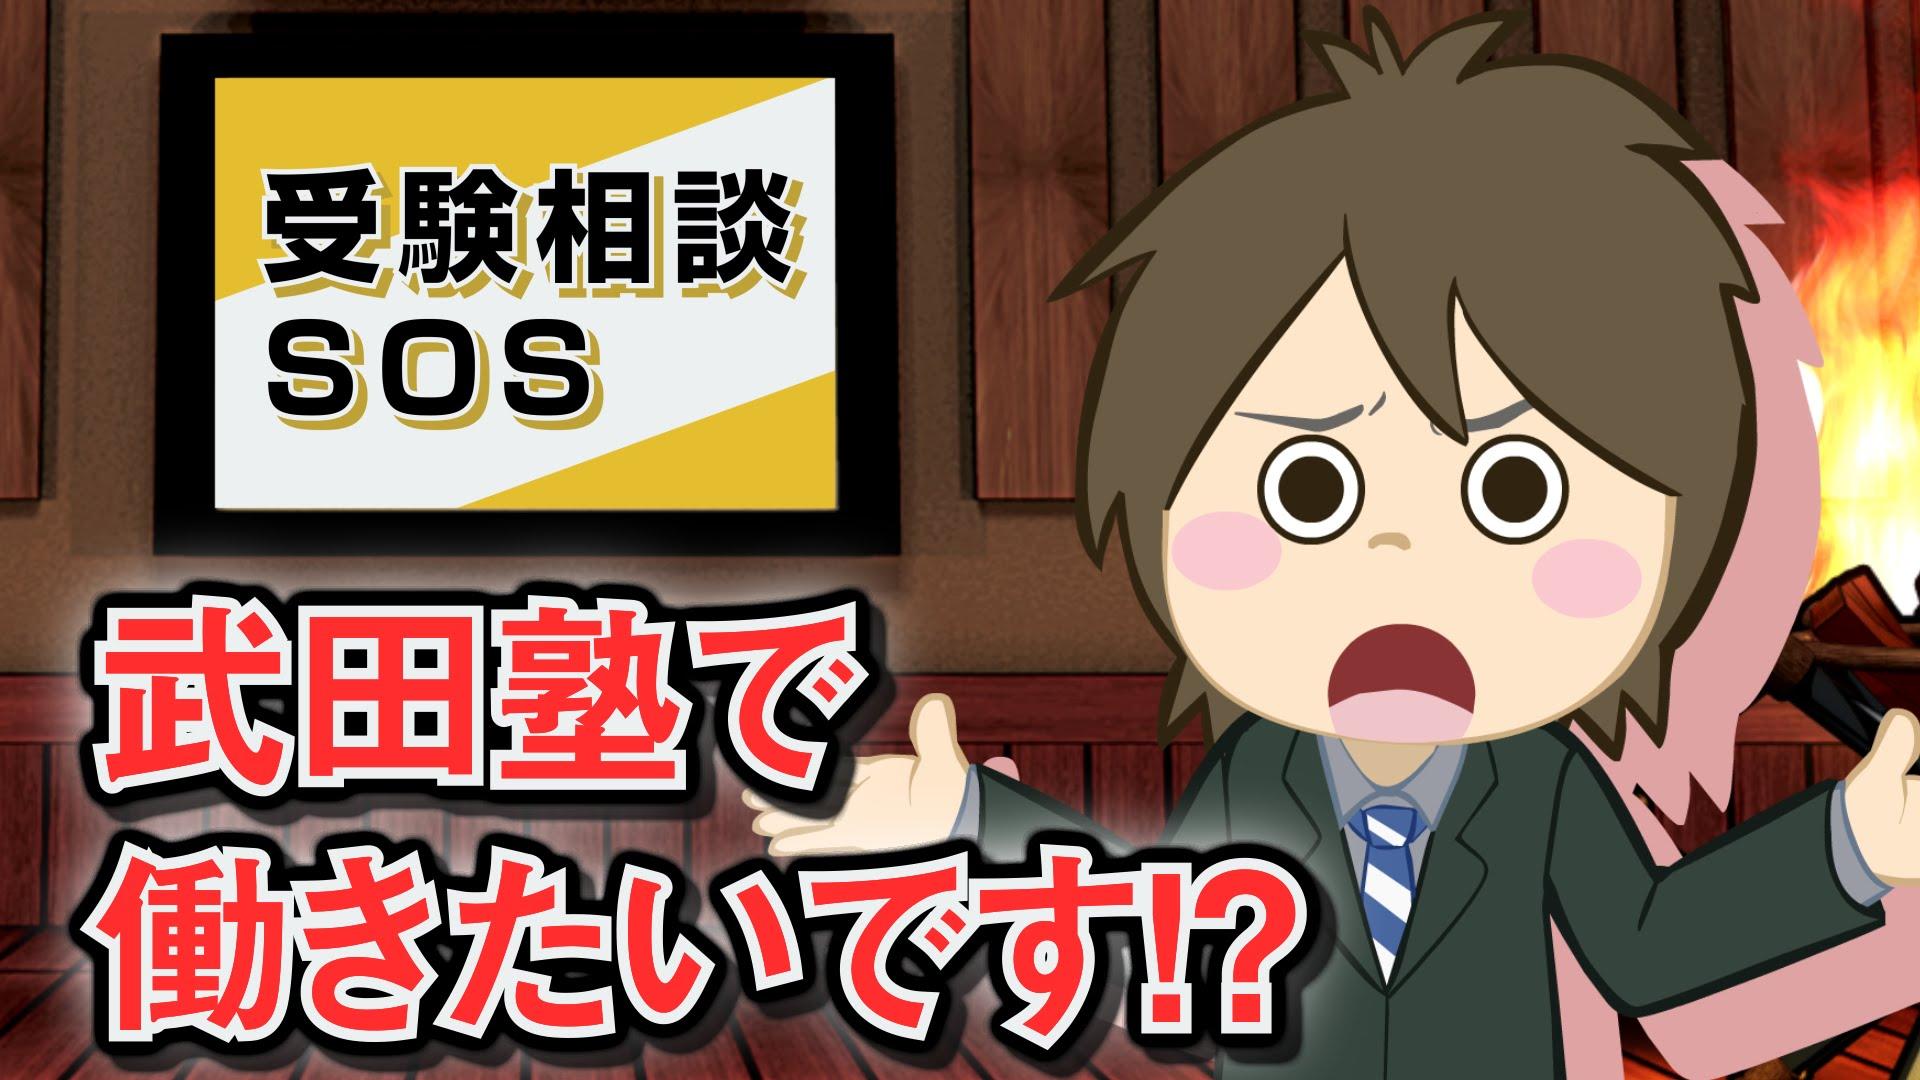 【vol.67】武田塾で働く方法!? 受験相談SOS